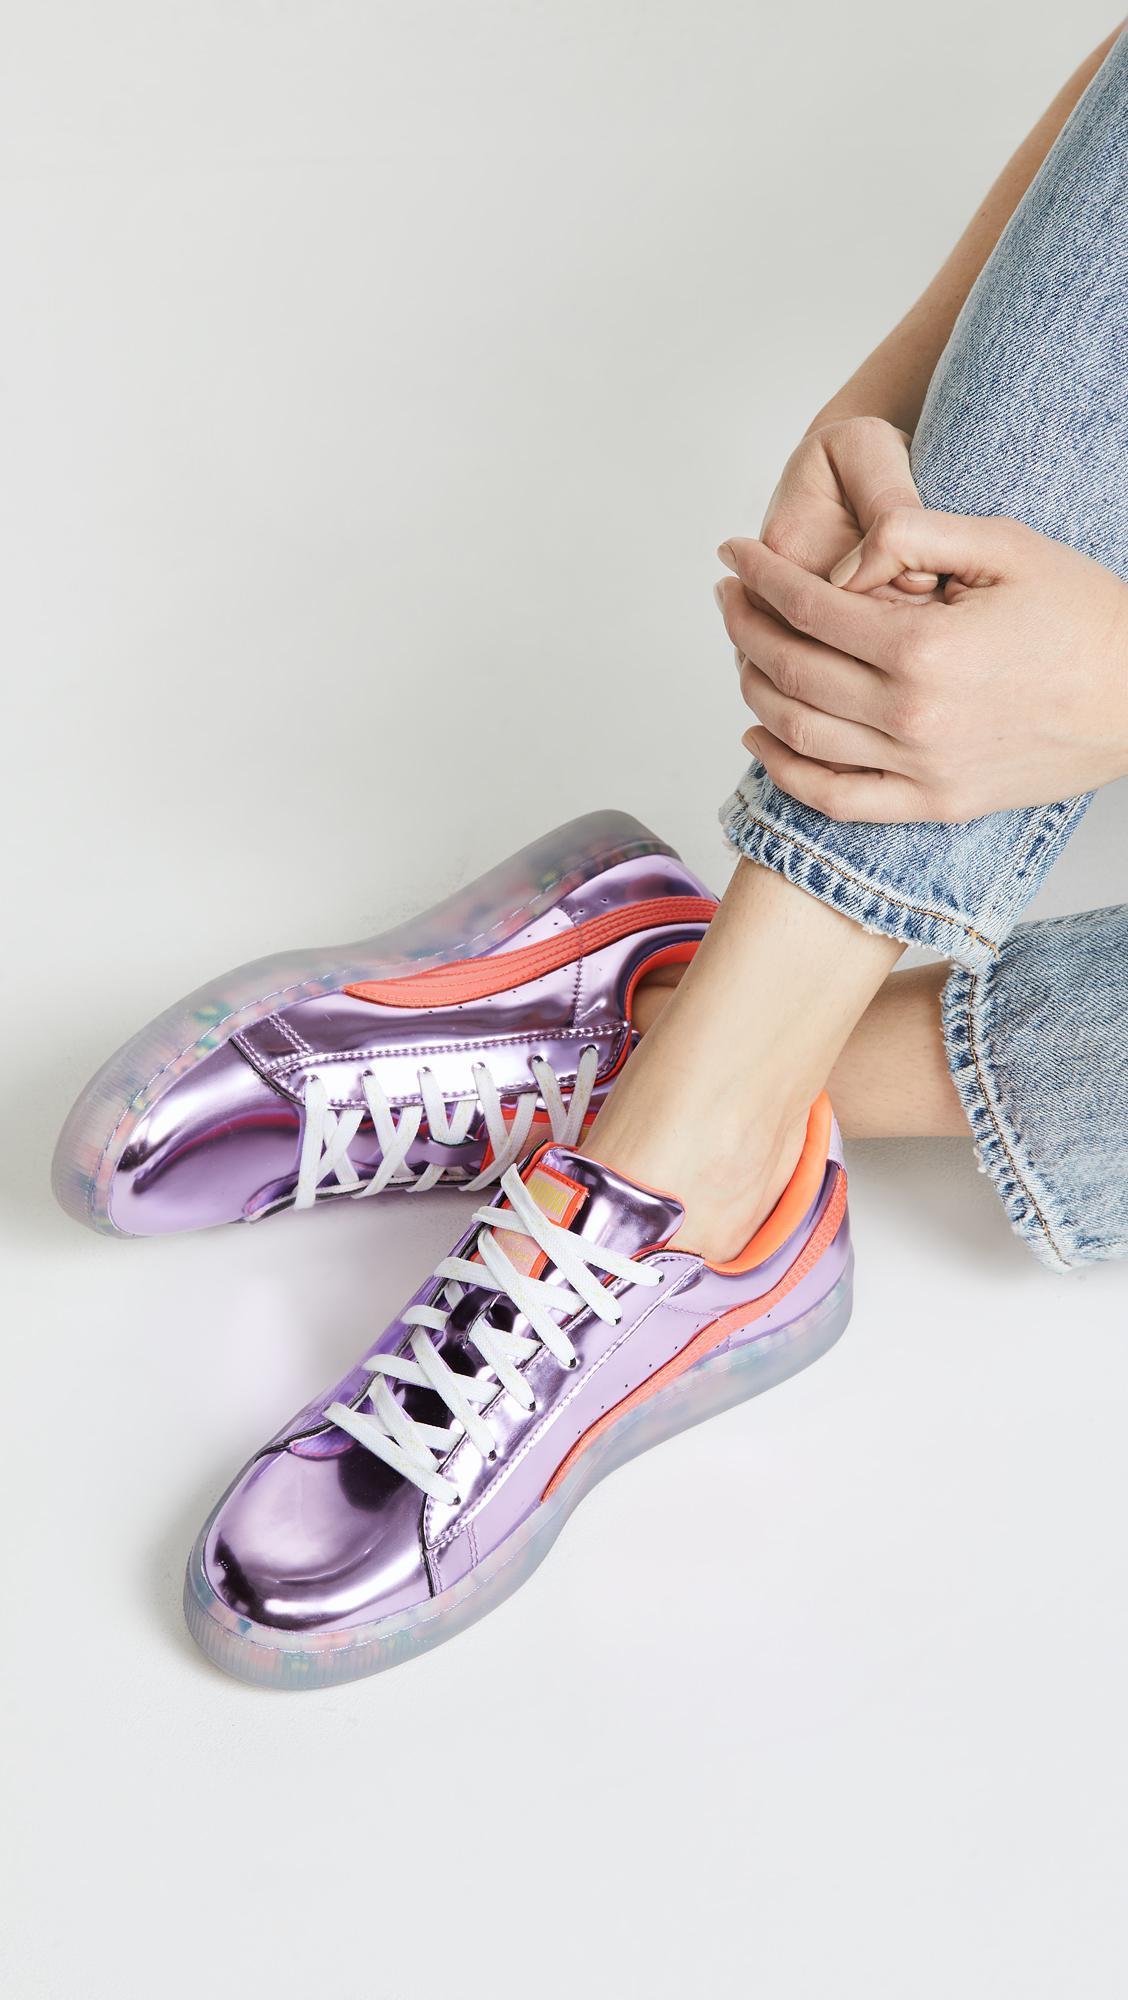 X Pumas Sophia Panier Webster Baskets Princesse Bonbons - Rose Et Violet nlFfTa0o7